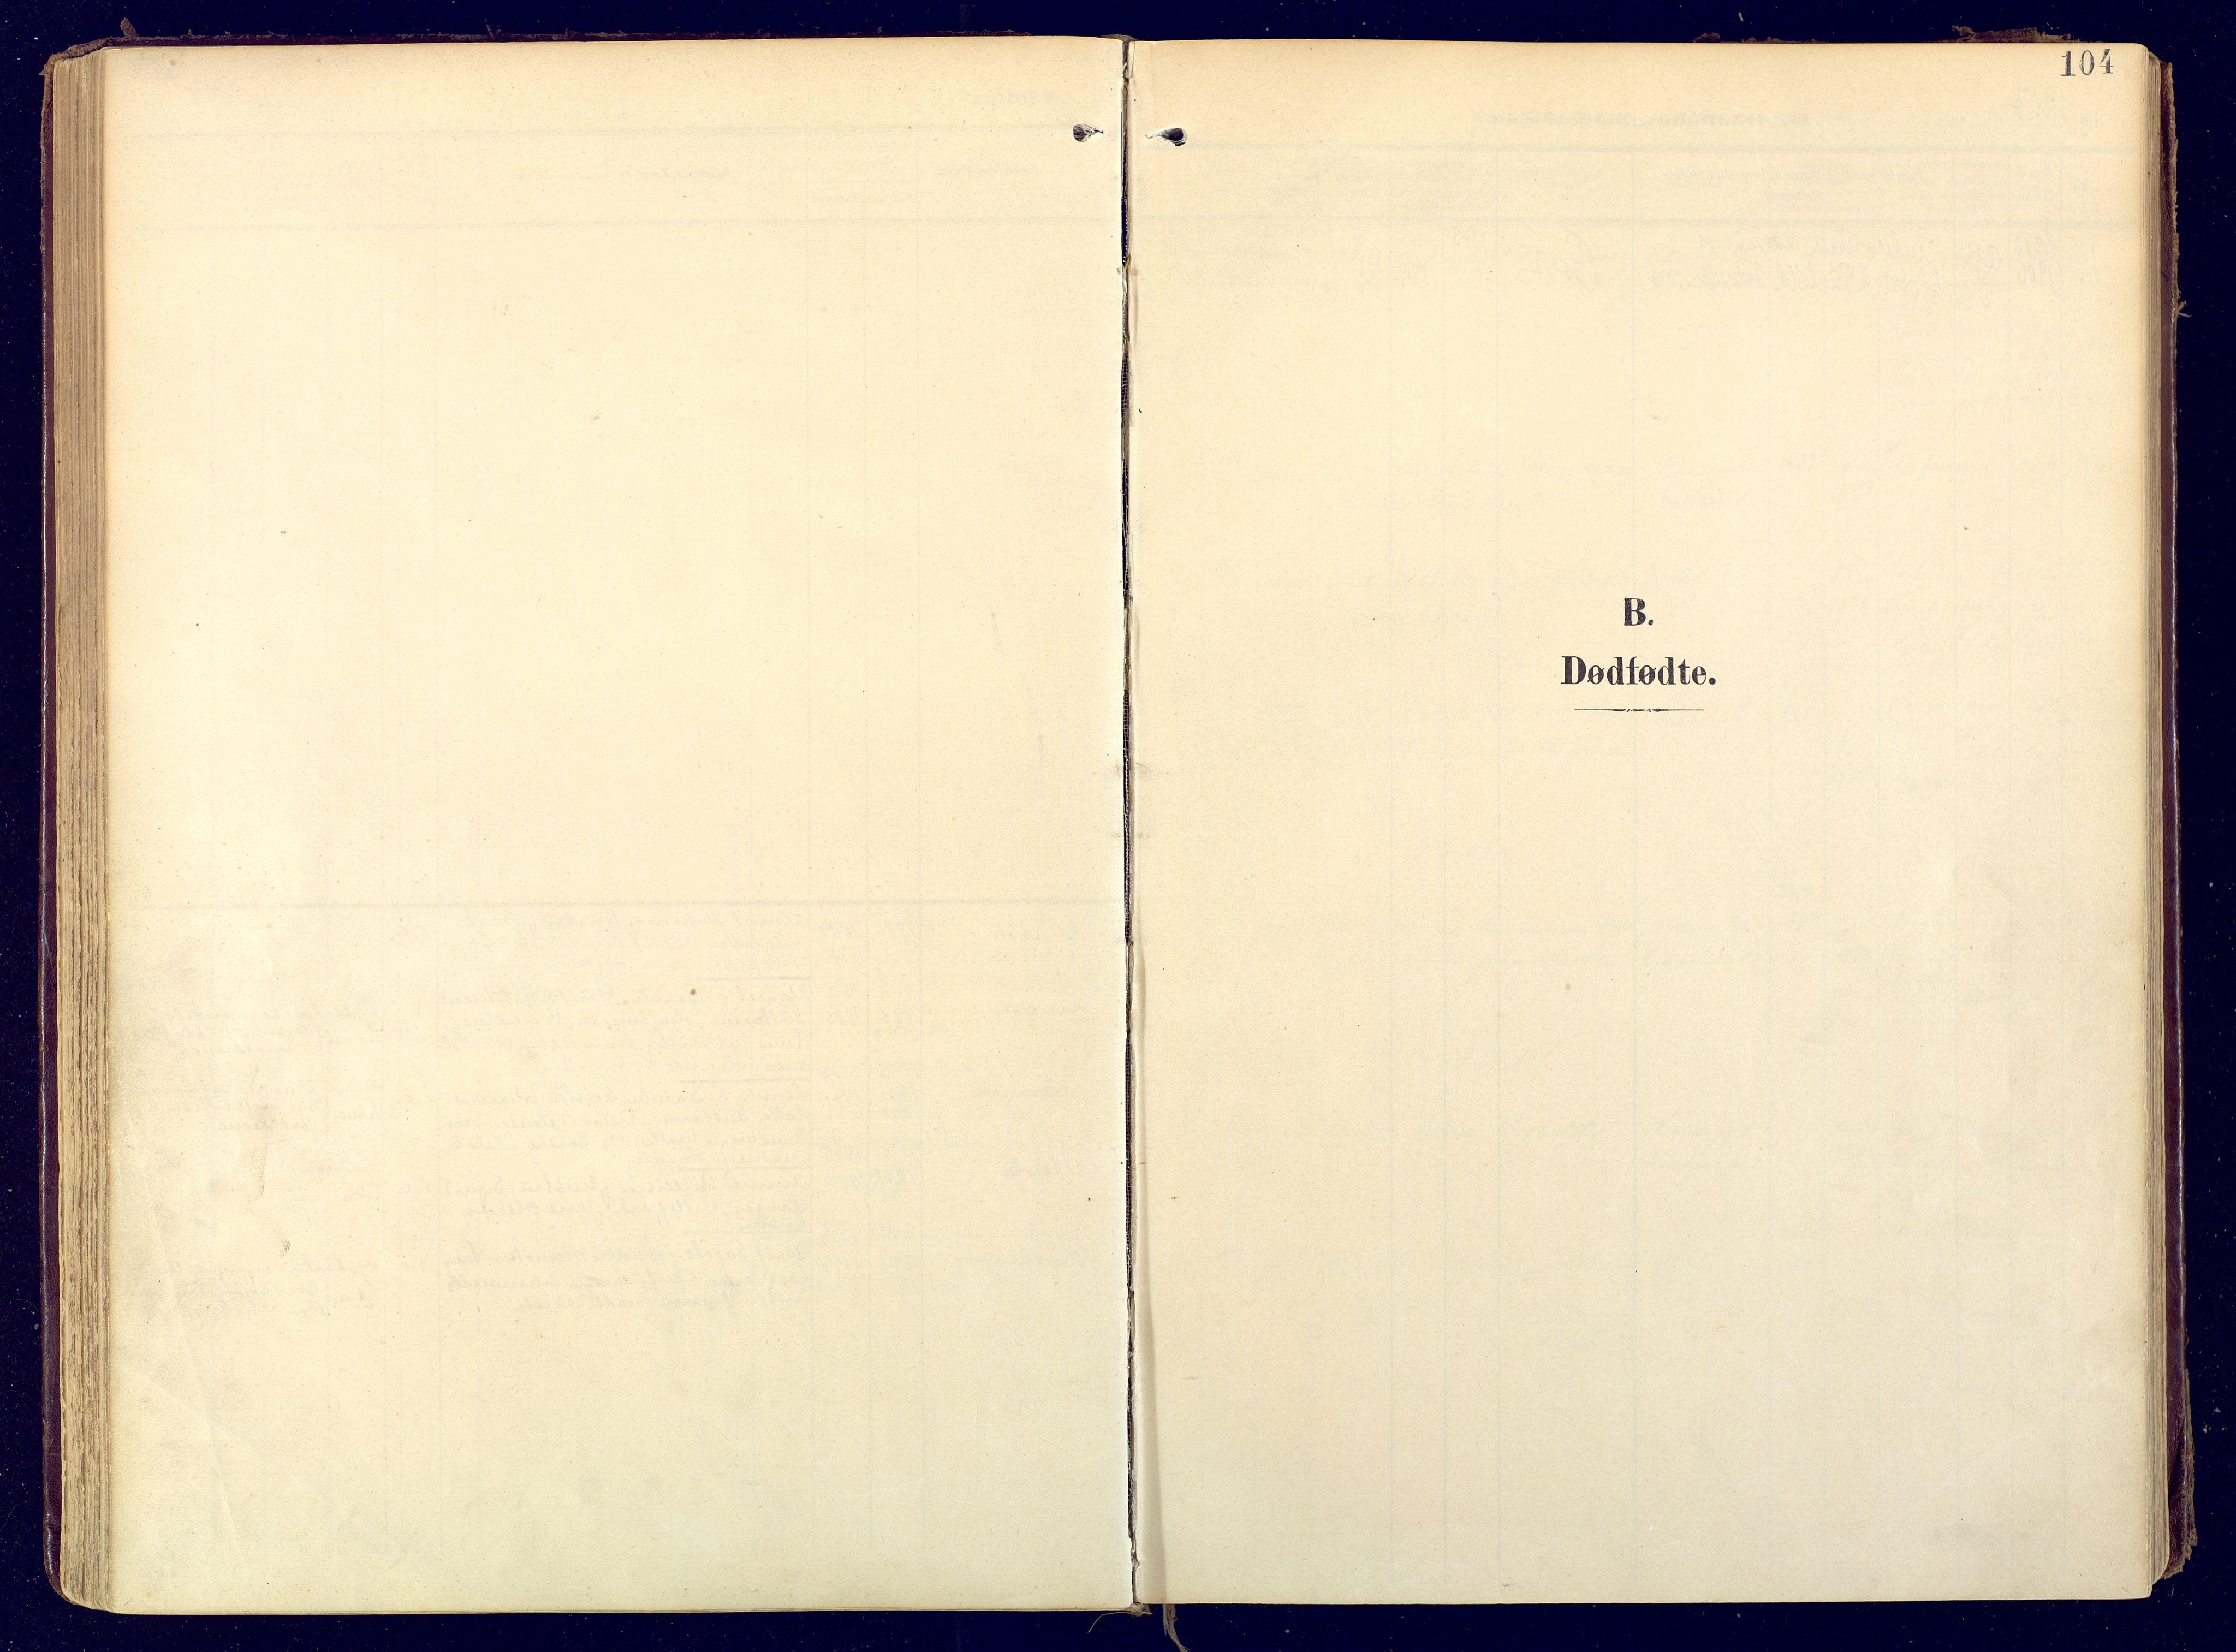 SATØ, Karasjok sokneprestkontor, H/Ha: Ministerialbok nr. 3, 1907-1926, s. 104